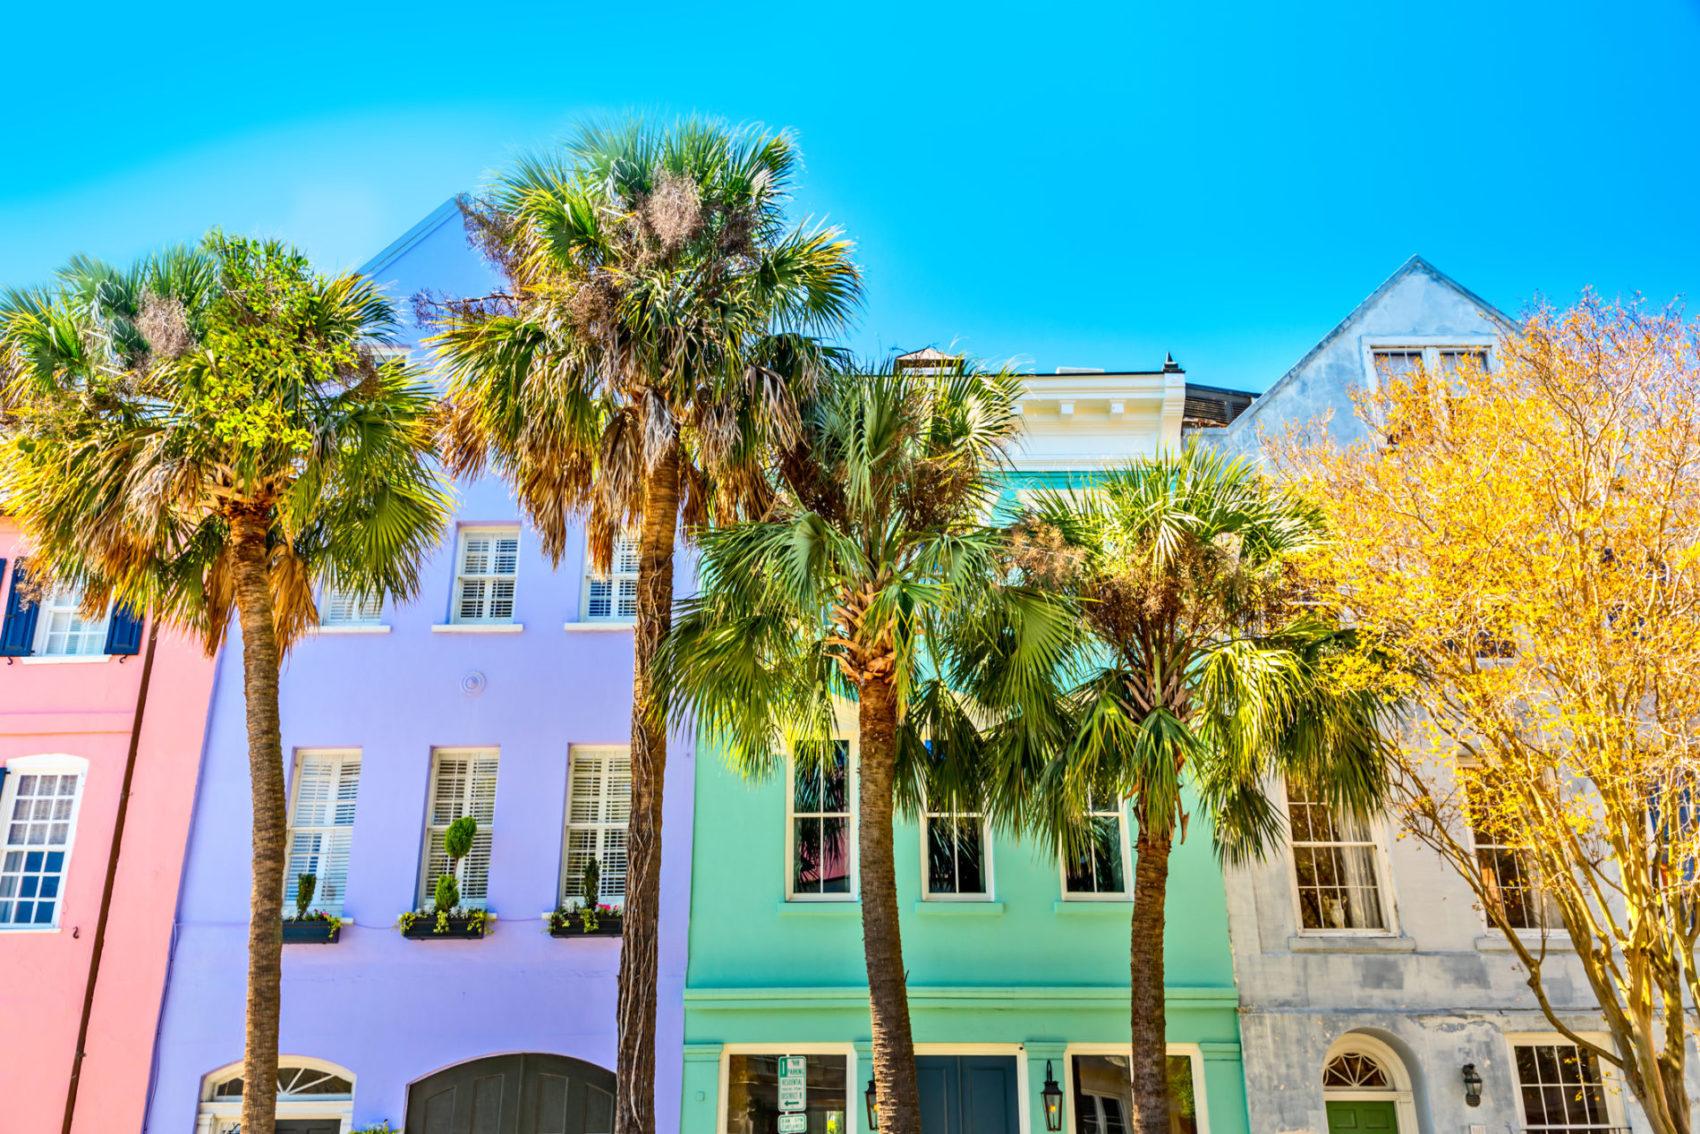 FITSNews – South Carolina Tourism Losses Hit $5.4 Billion